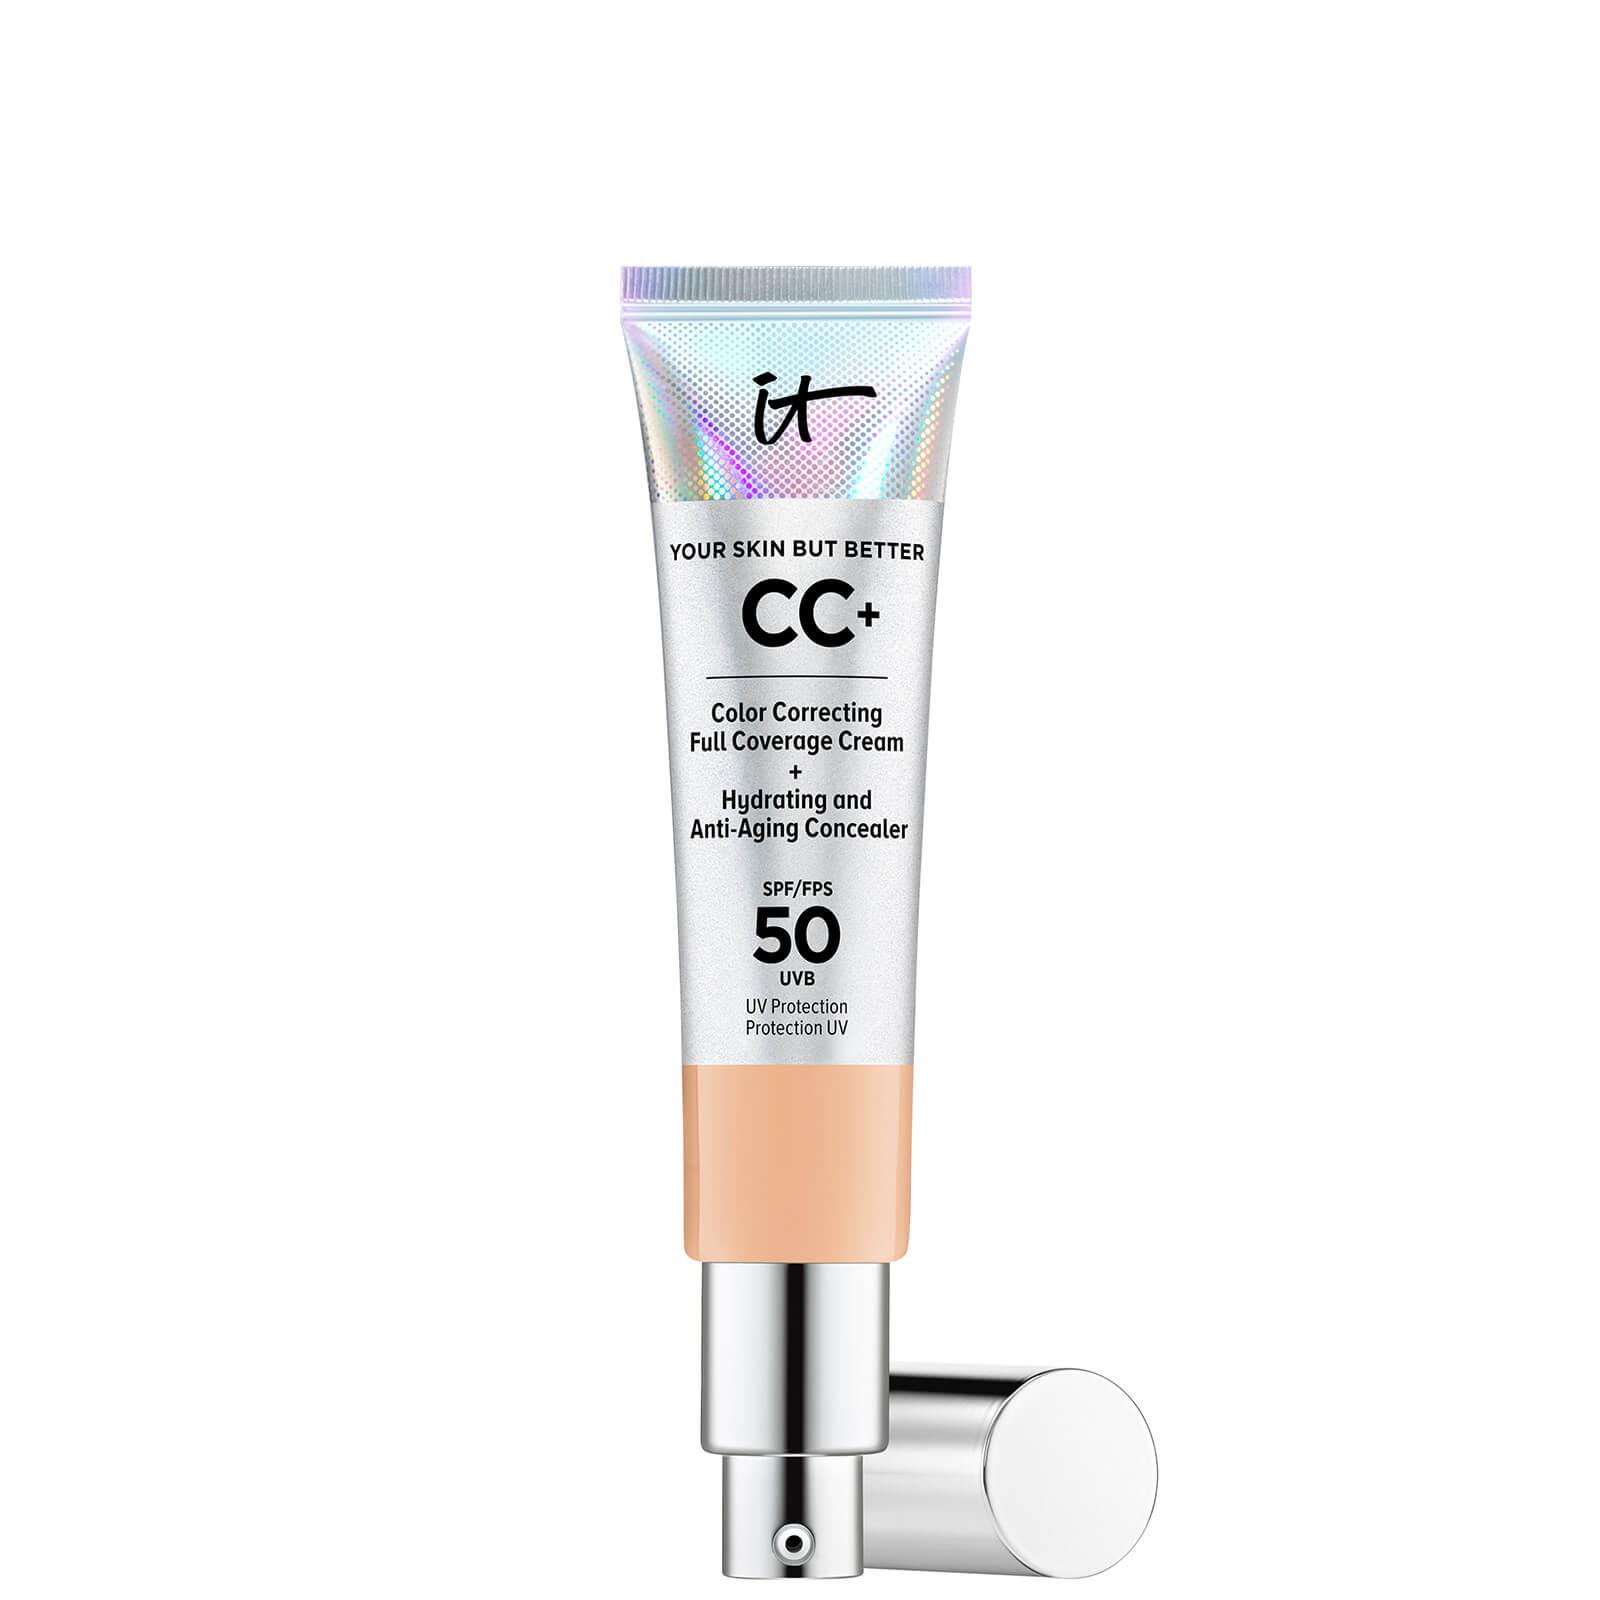 Купить IT Cosmetics Your Skin But Better CC+ Cream with SPF50 32ml (Various Shades) - Neutral Medium